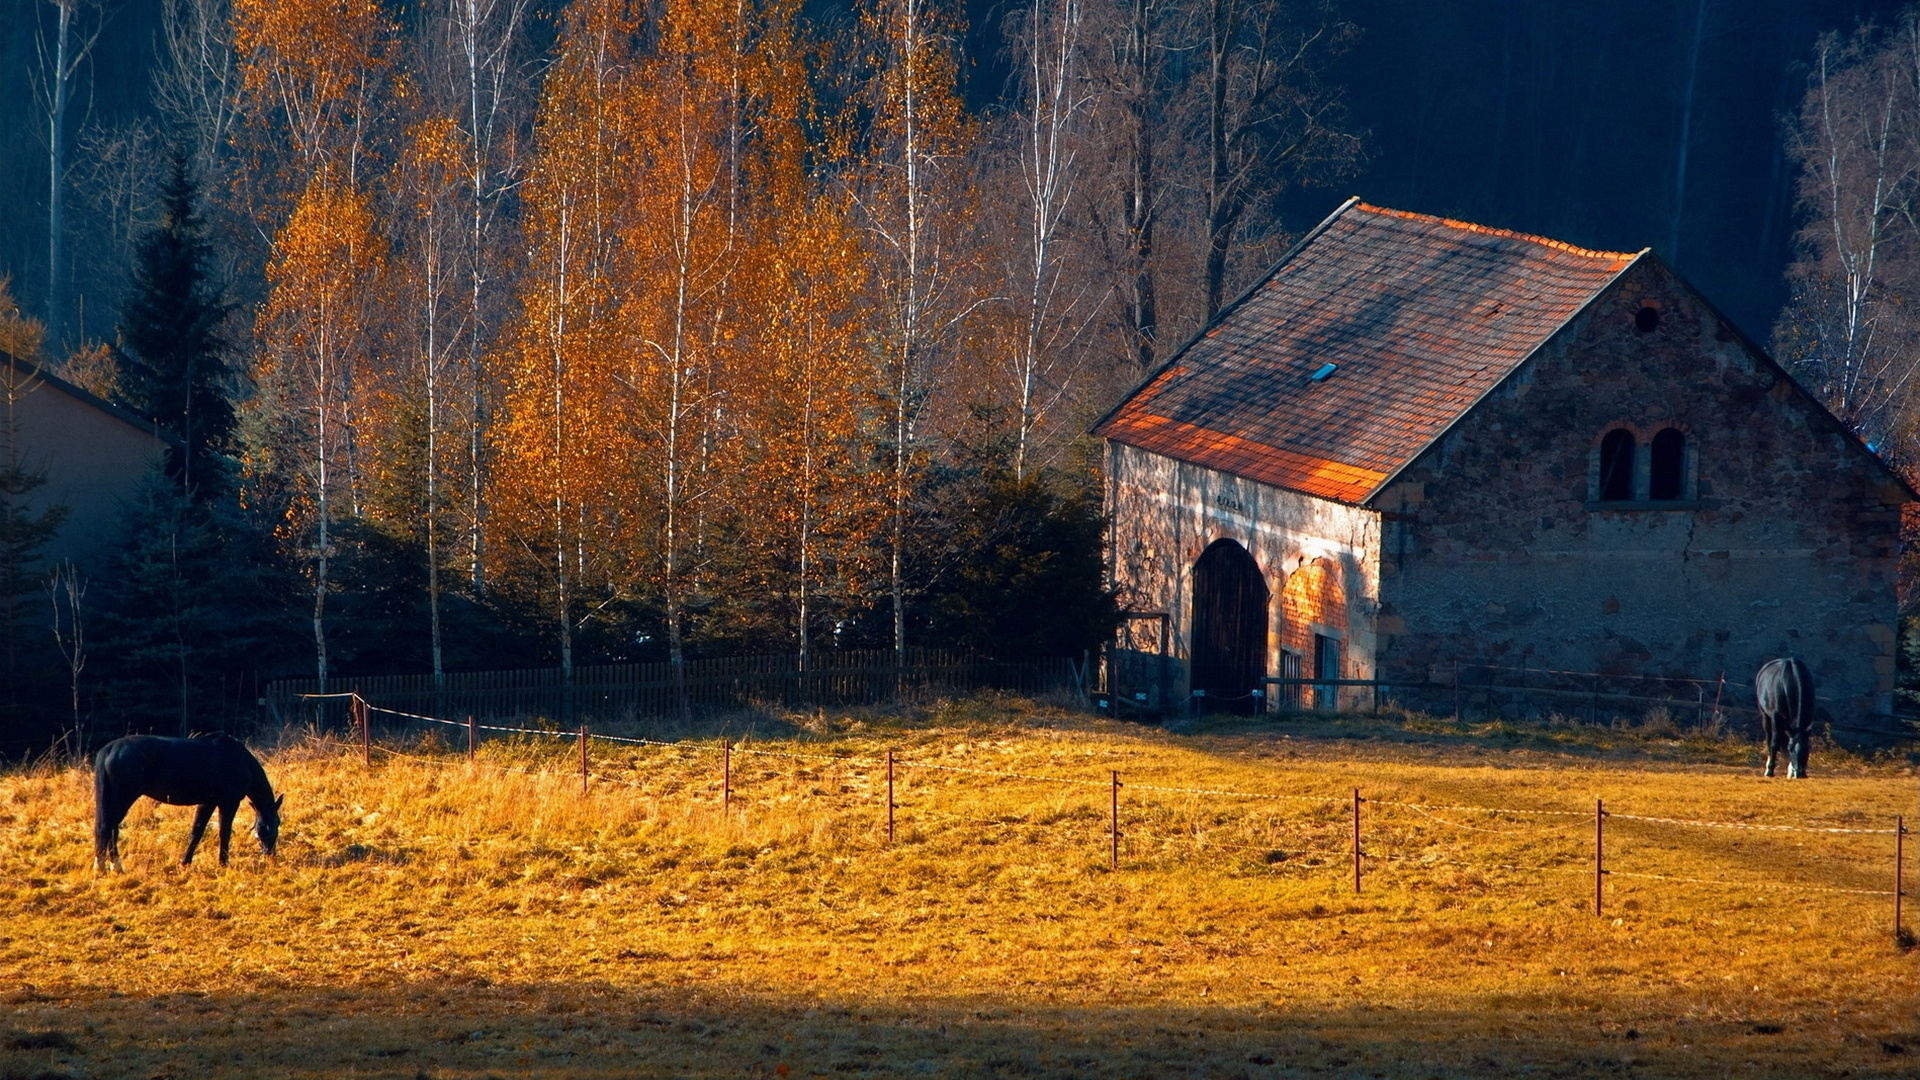 Horses rustic farm barn landscapes buildings autumn fall 1920x1080